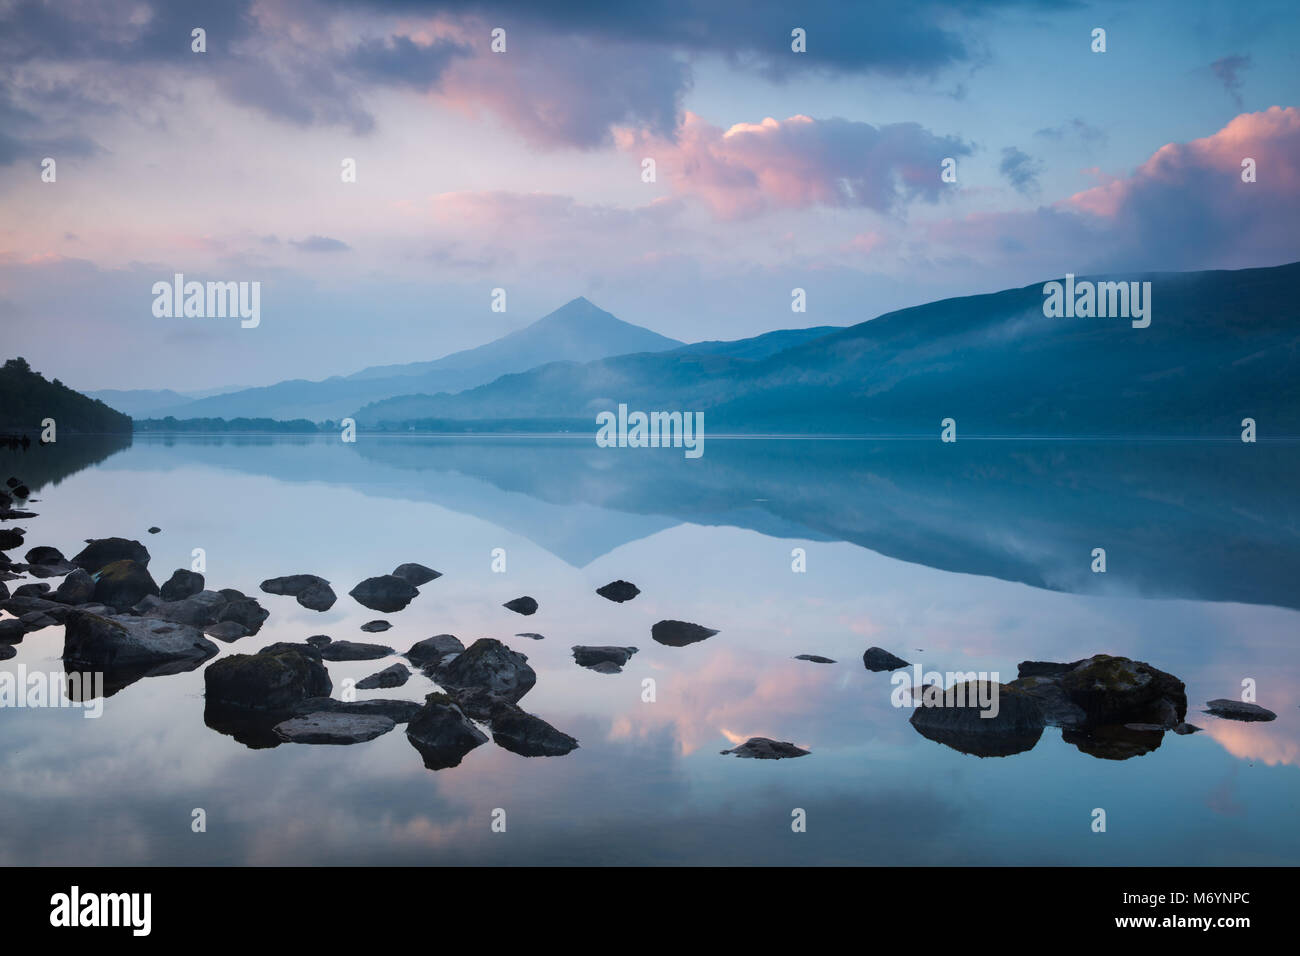 Schiehallion reflected in Loch Rannoch at dawn, Perthshire, Scotland, UK - Stock Image